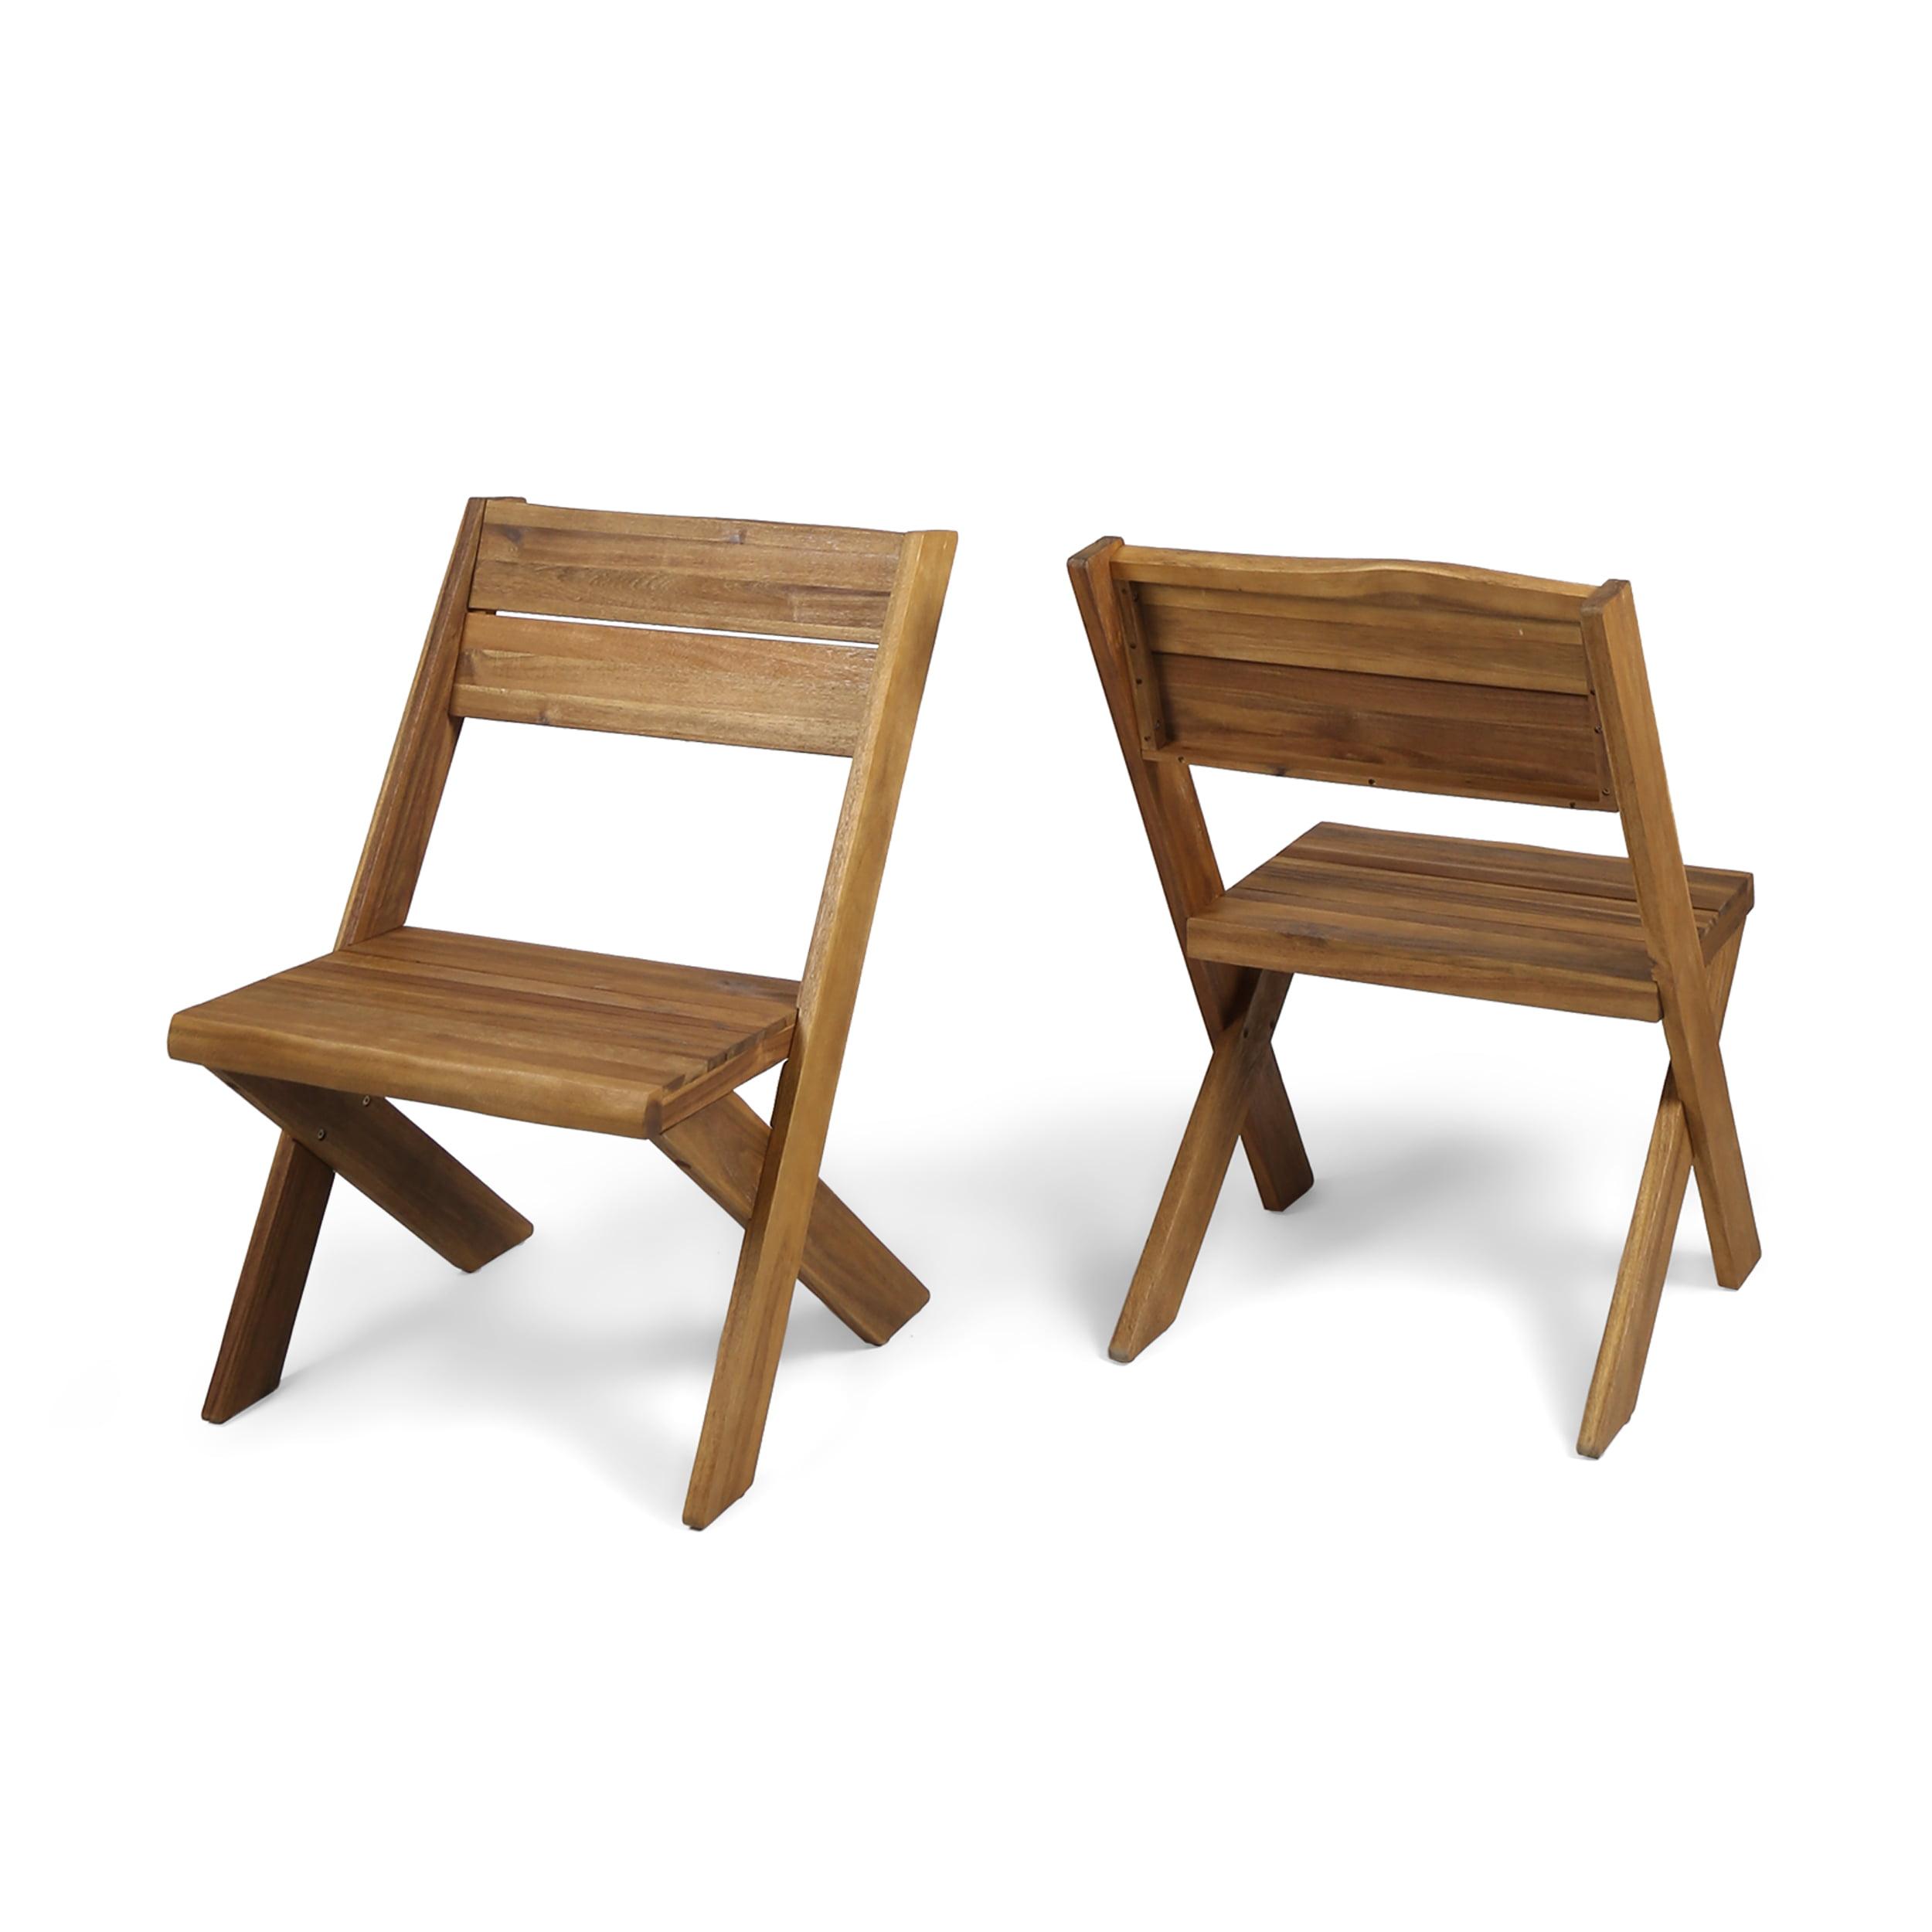 Irene Outdoor Farmhouse Acacia Wood Chairs, Set of 2, Teak